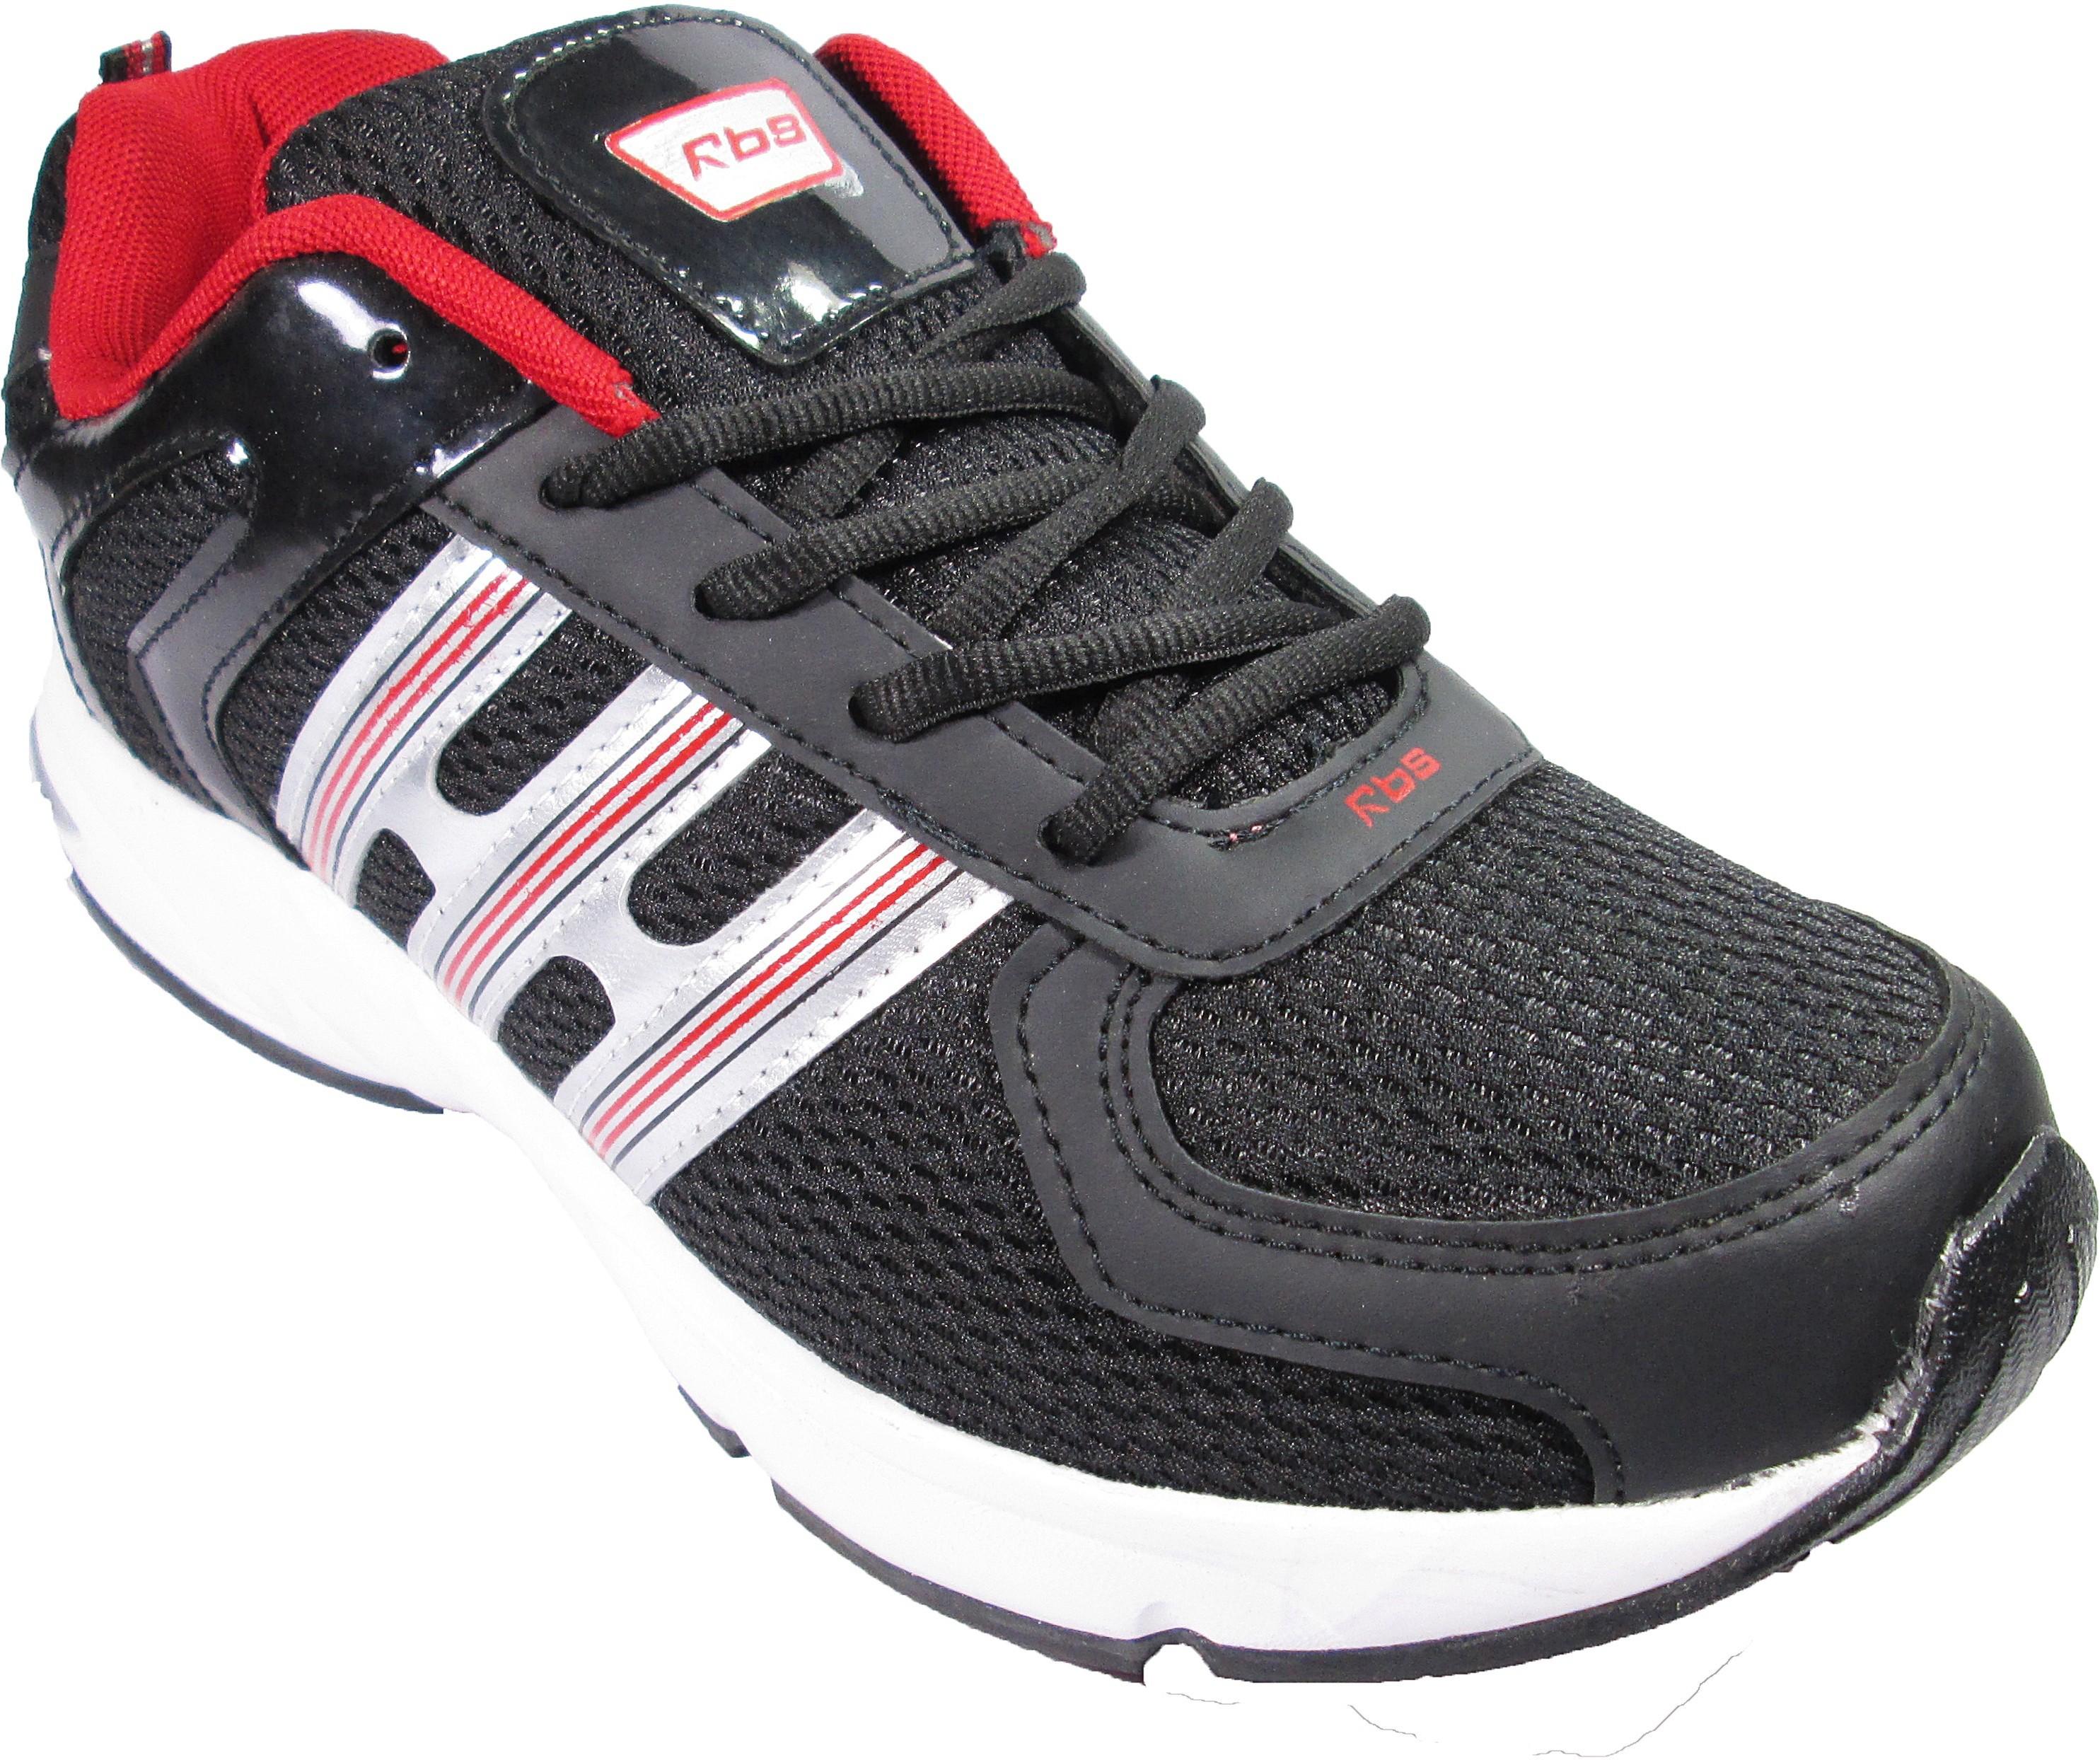 Rbs Wego Running Shoes